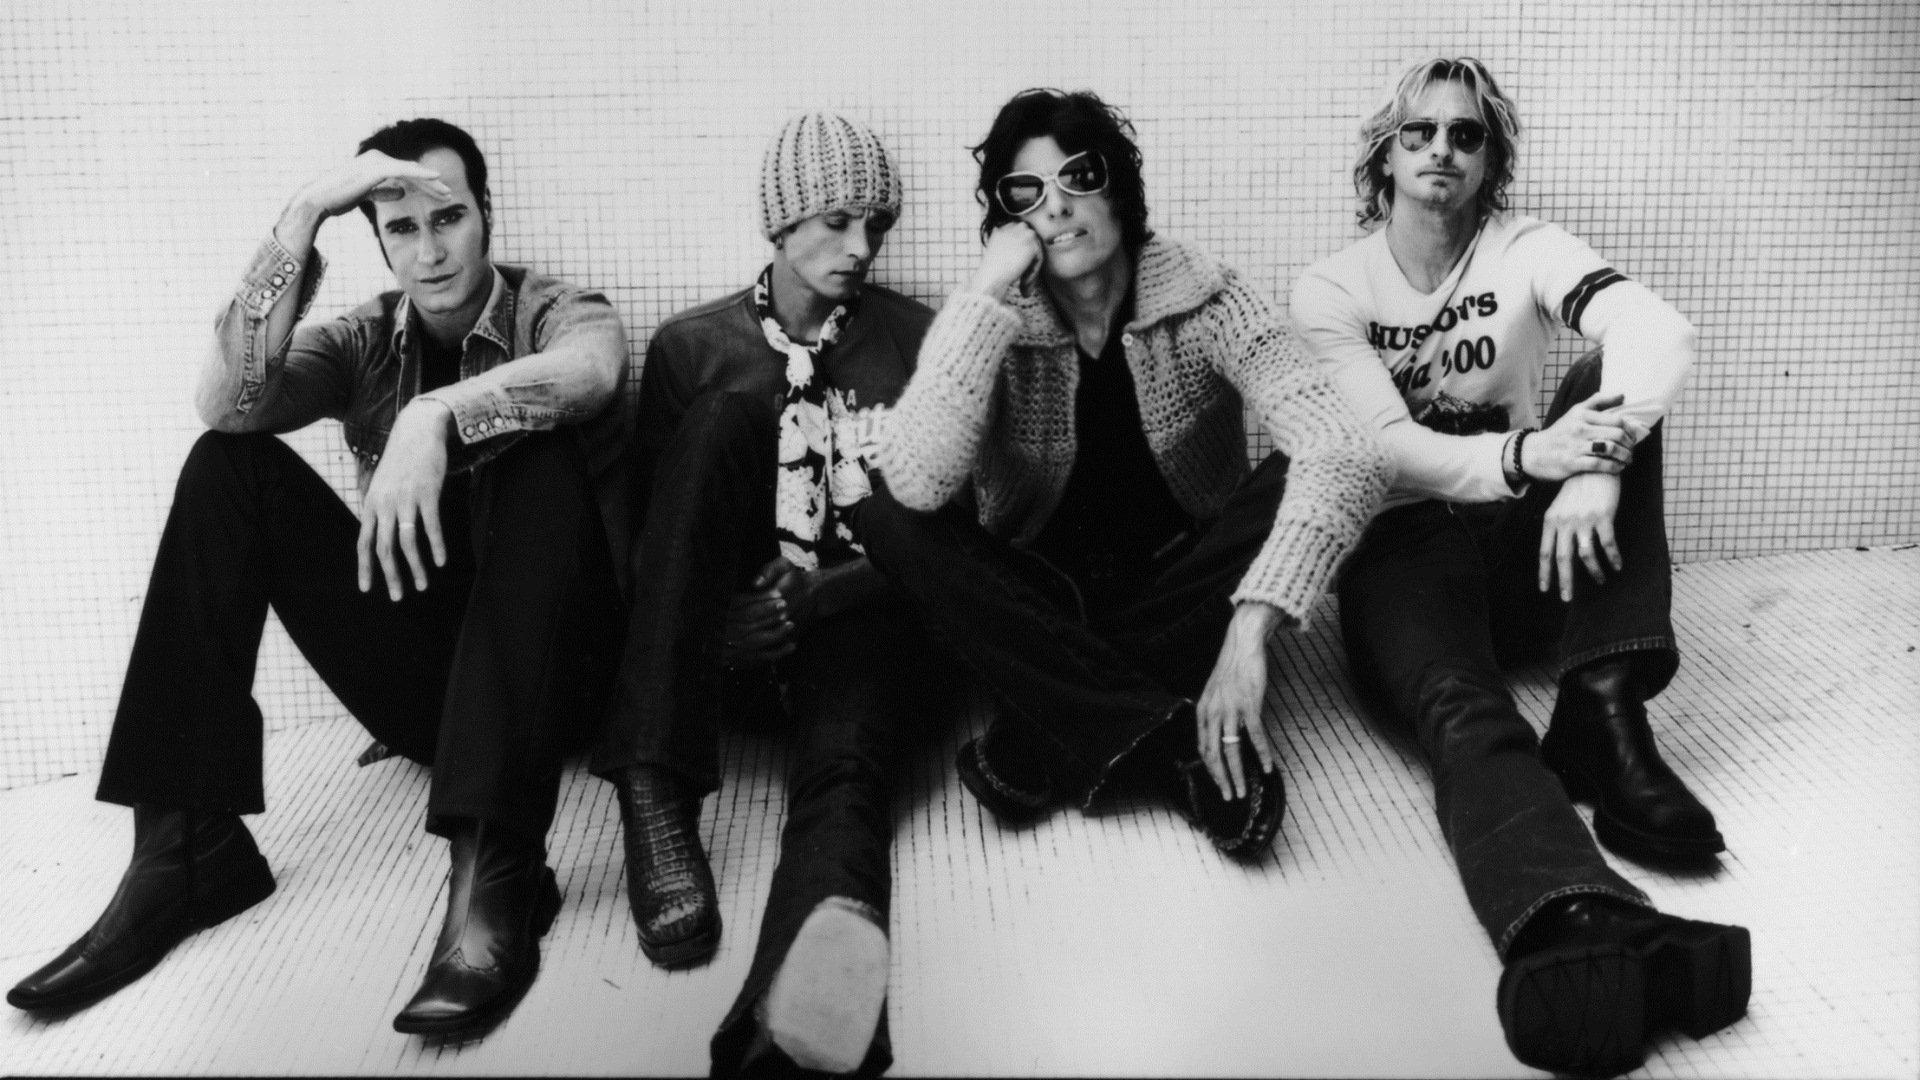 STONE TEMPLE PILOTS alternative hard rock grunge metal wallpaper    Stone Temple Pilots 90s